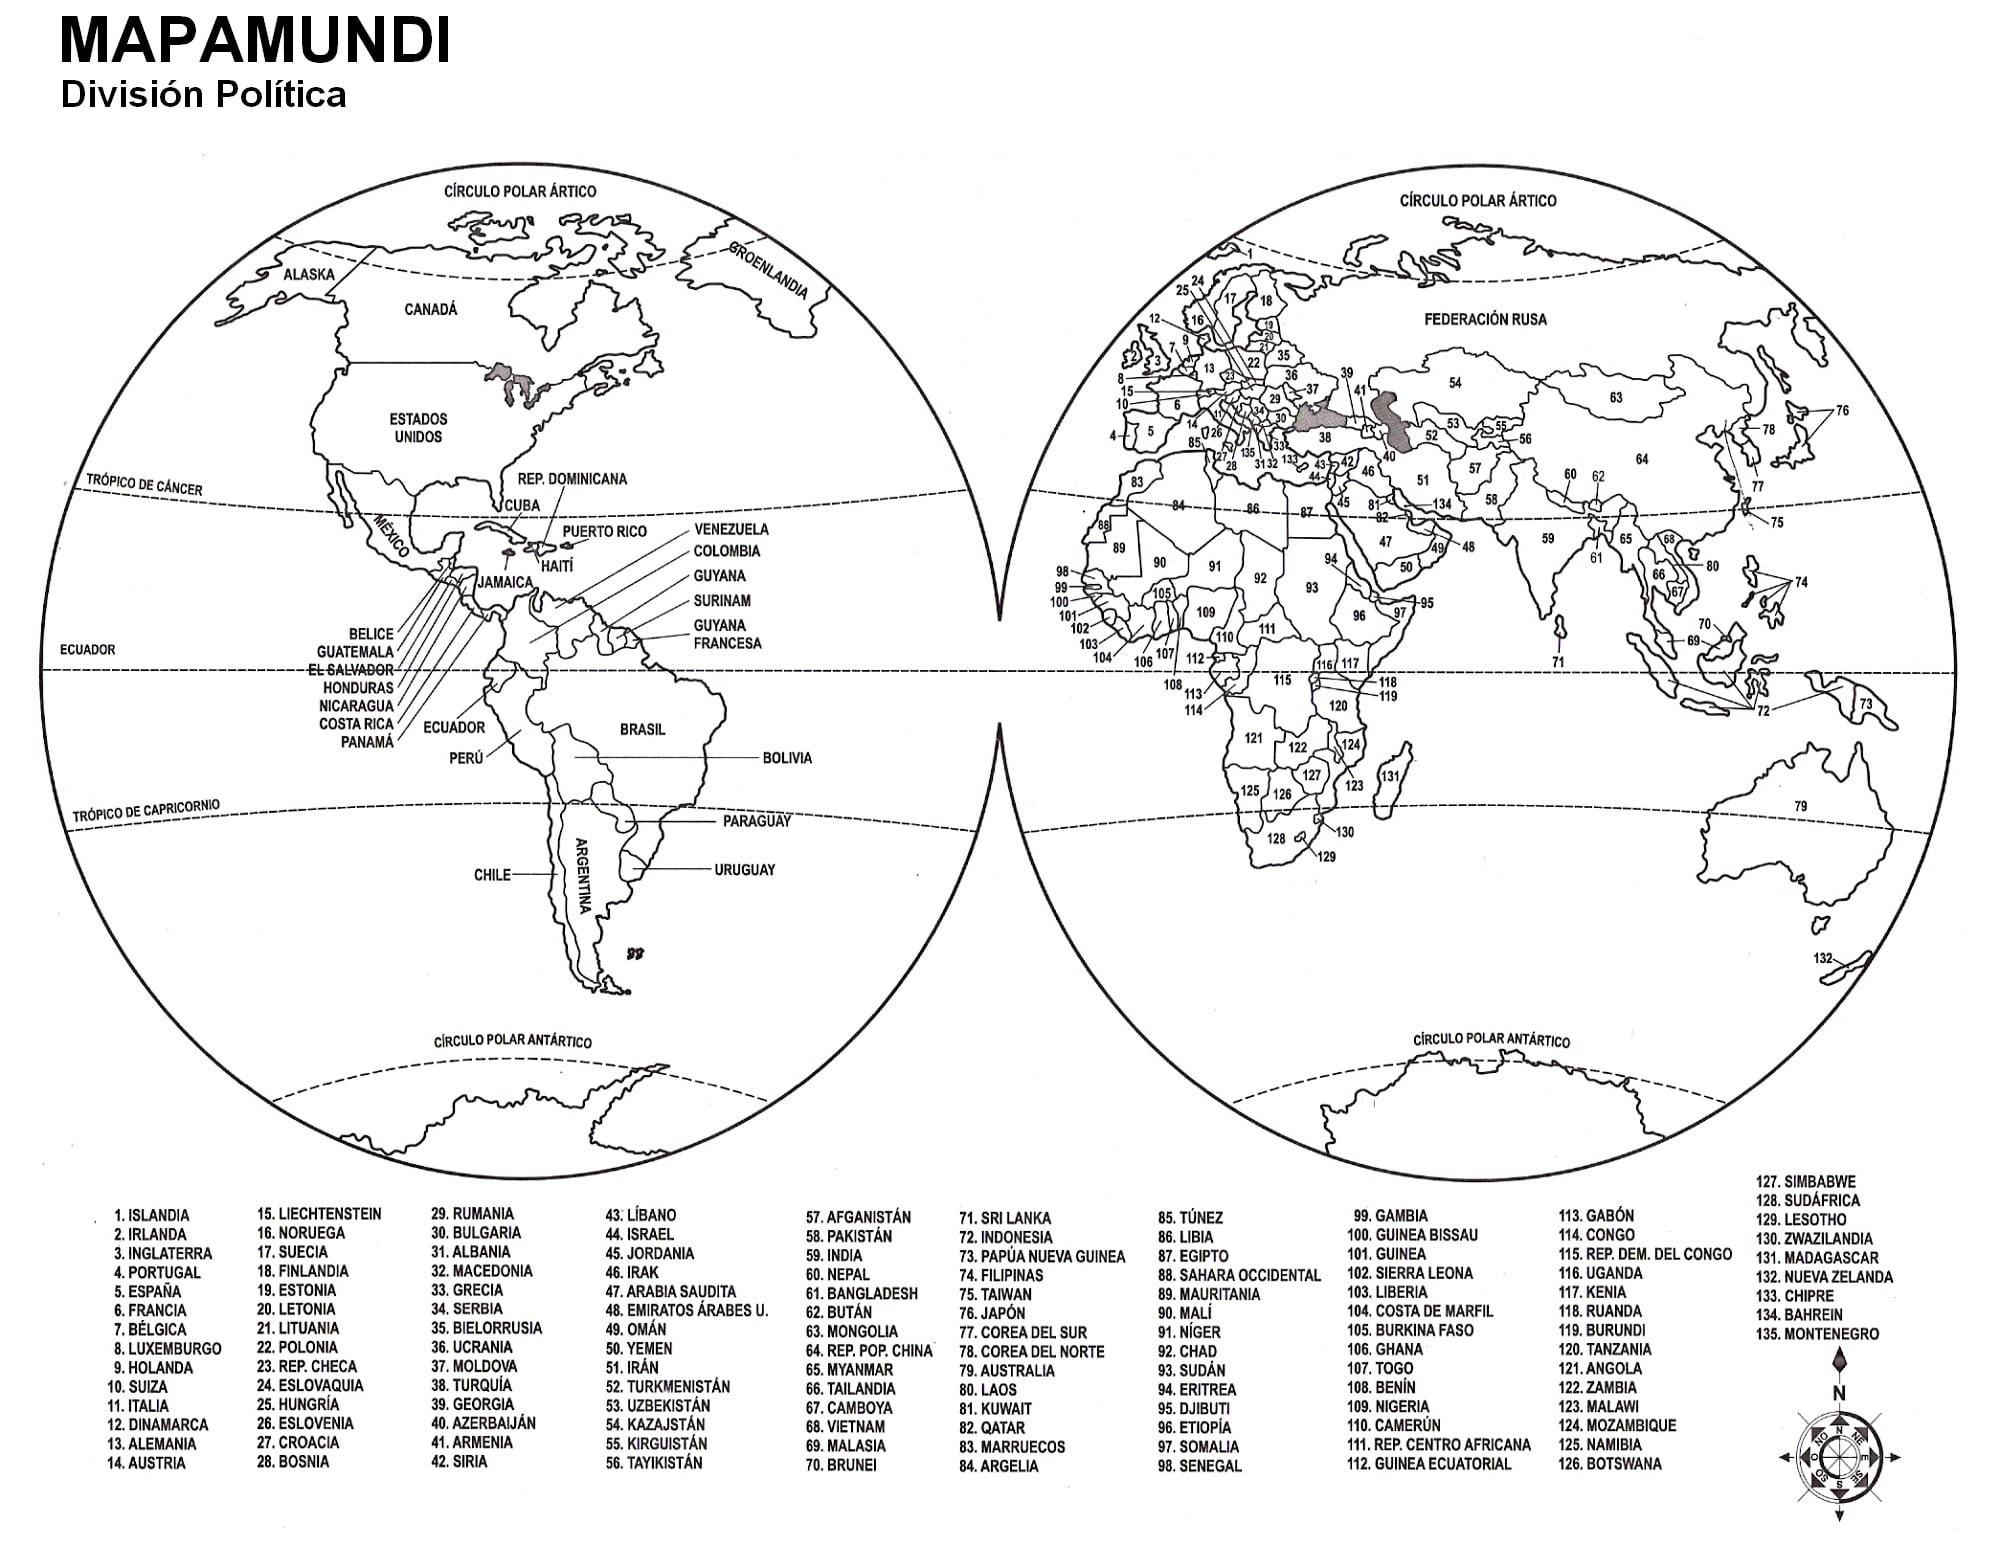 20 Mapas Mundi Preto E Branco Para Imprimir E Colorir Educacao